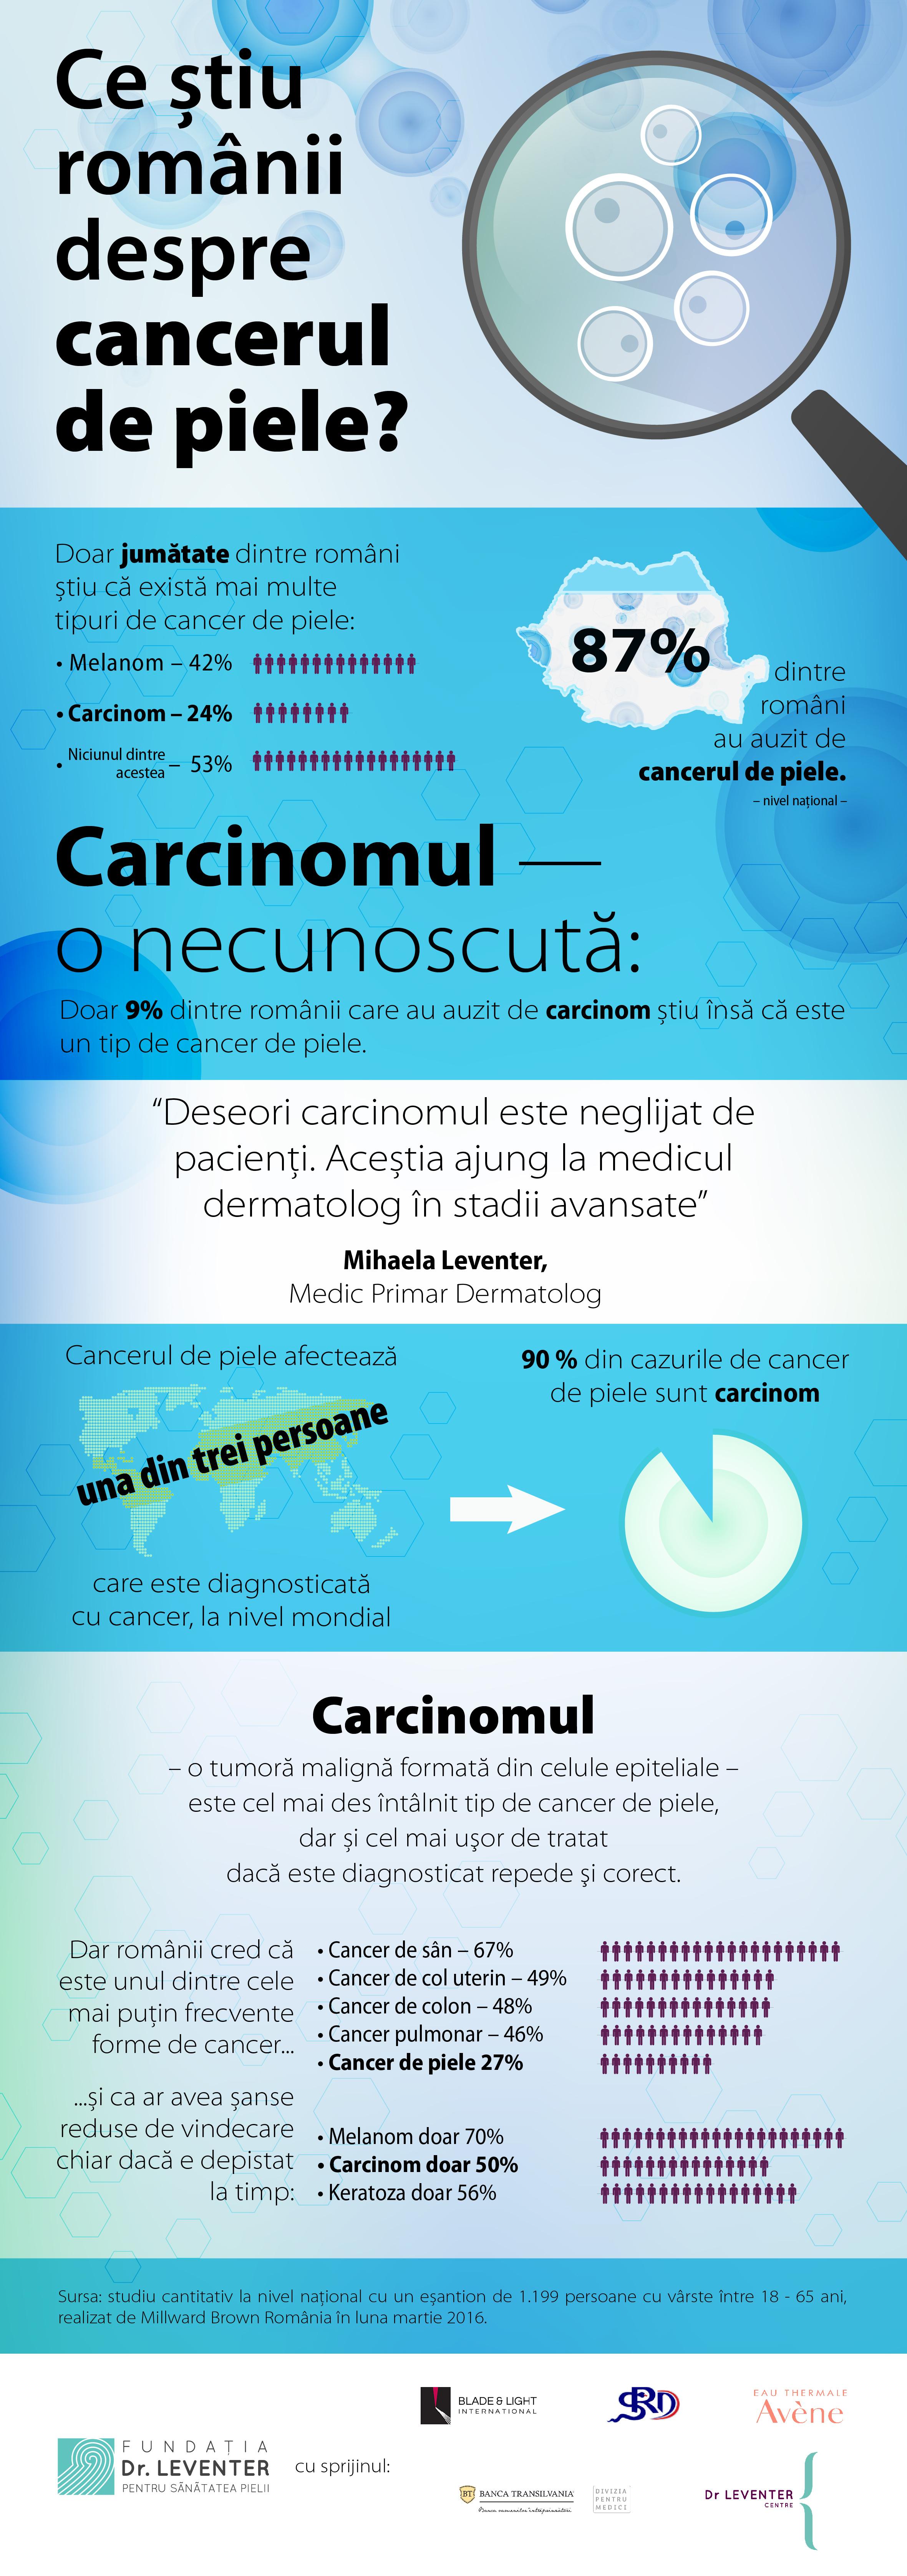 Cancerul de piele in Romania – intre statistici si realitate